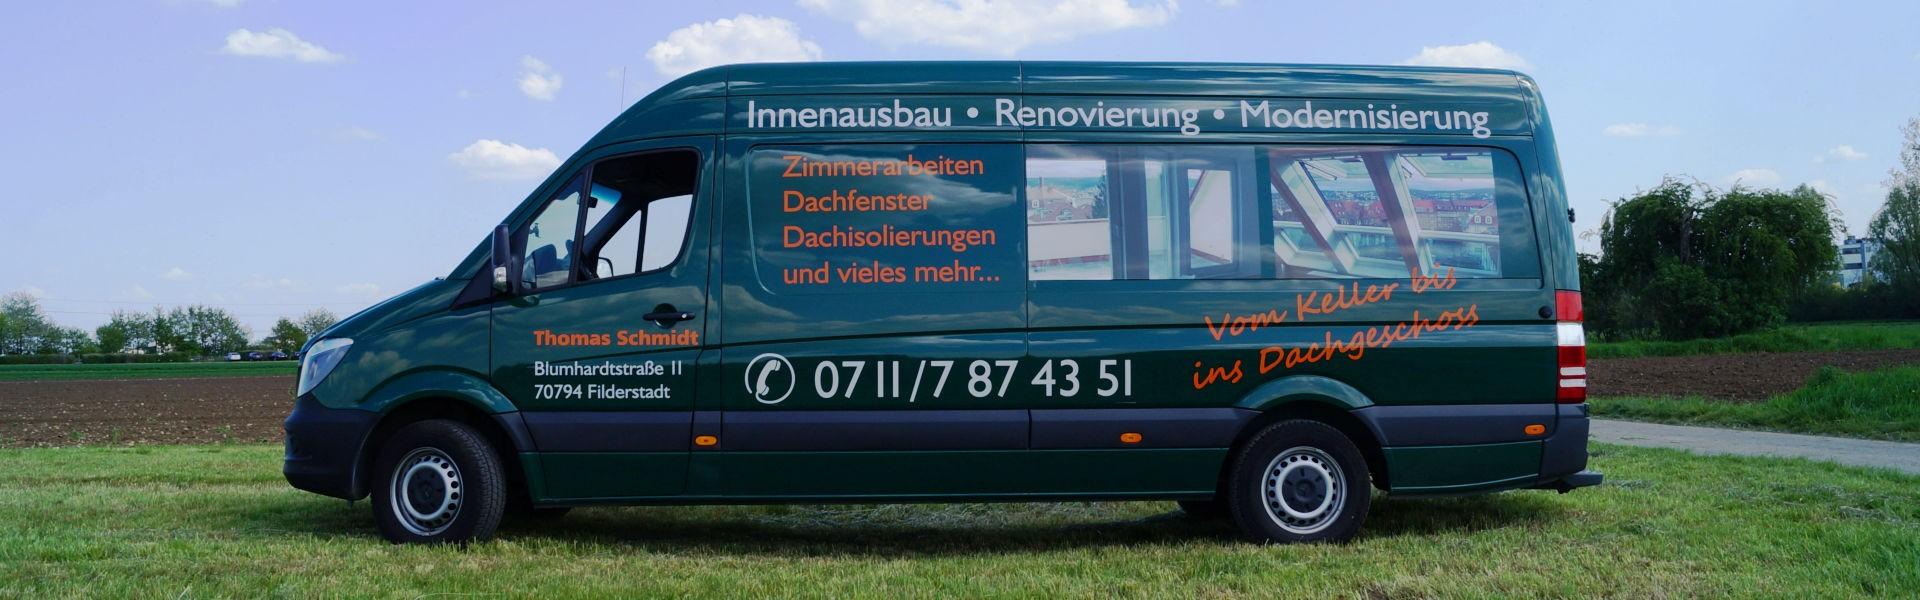 Fahrzeugbeschriftung Stuttgart: Werbung auf Fahrzeugen aller Art